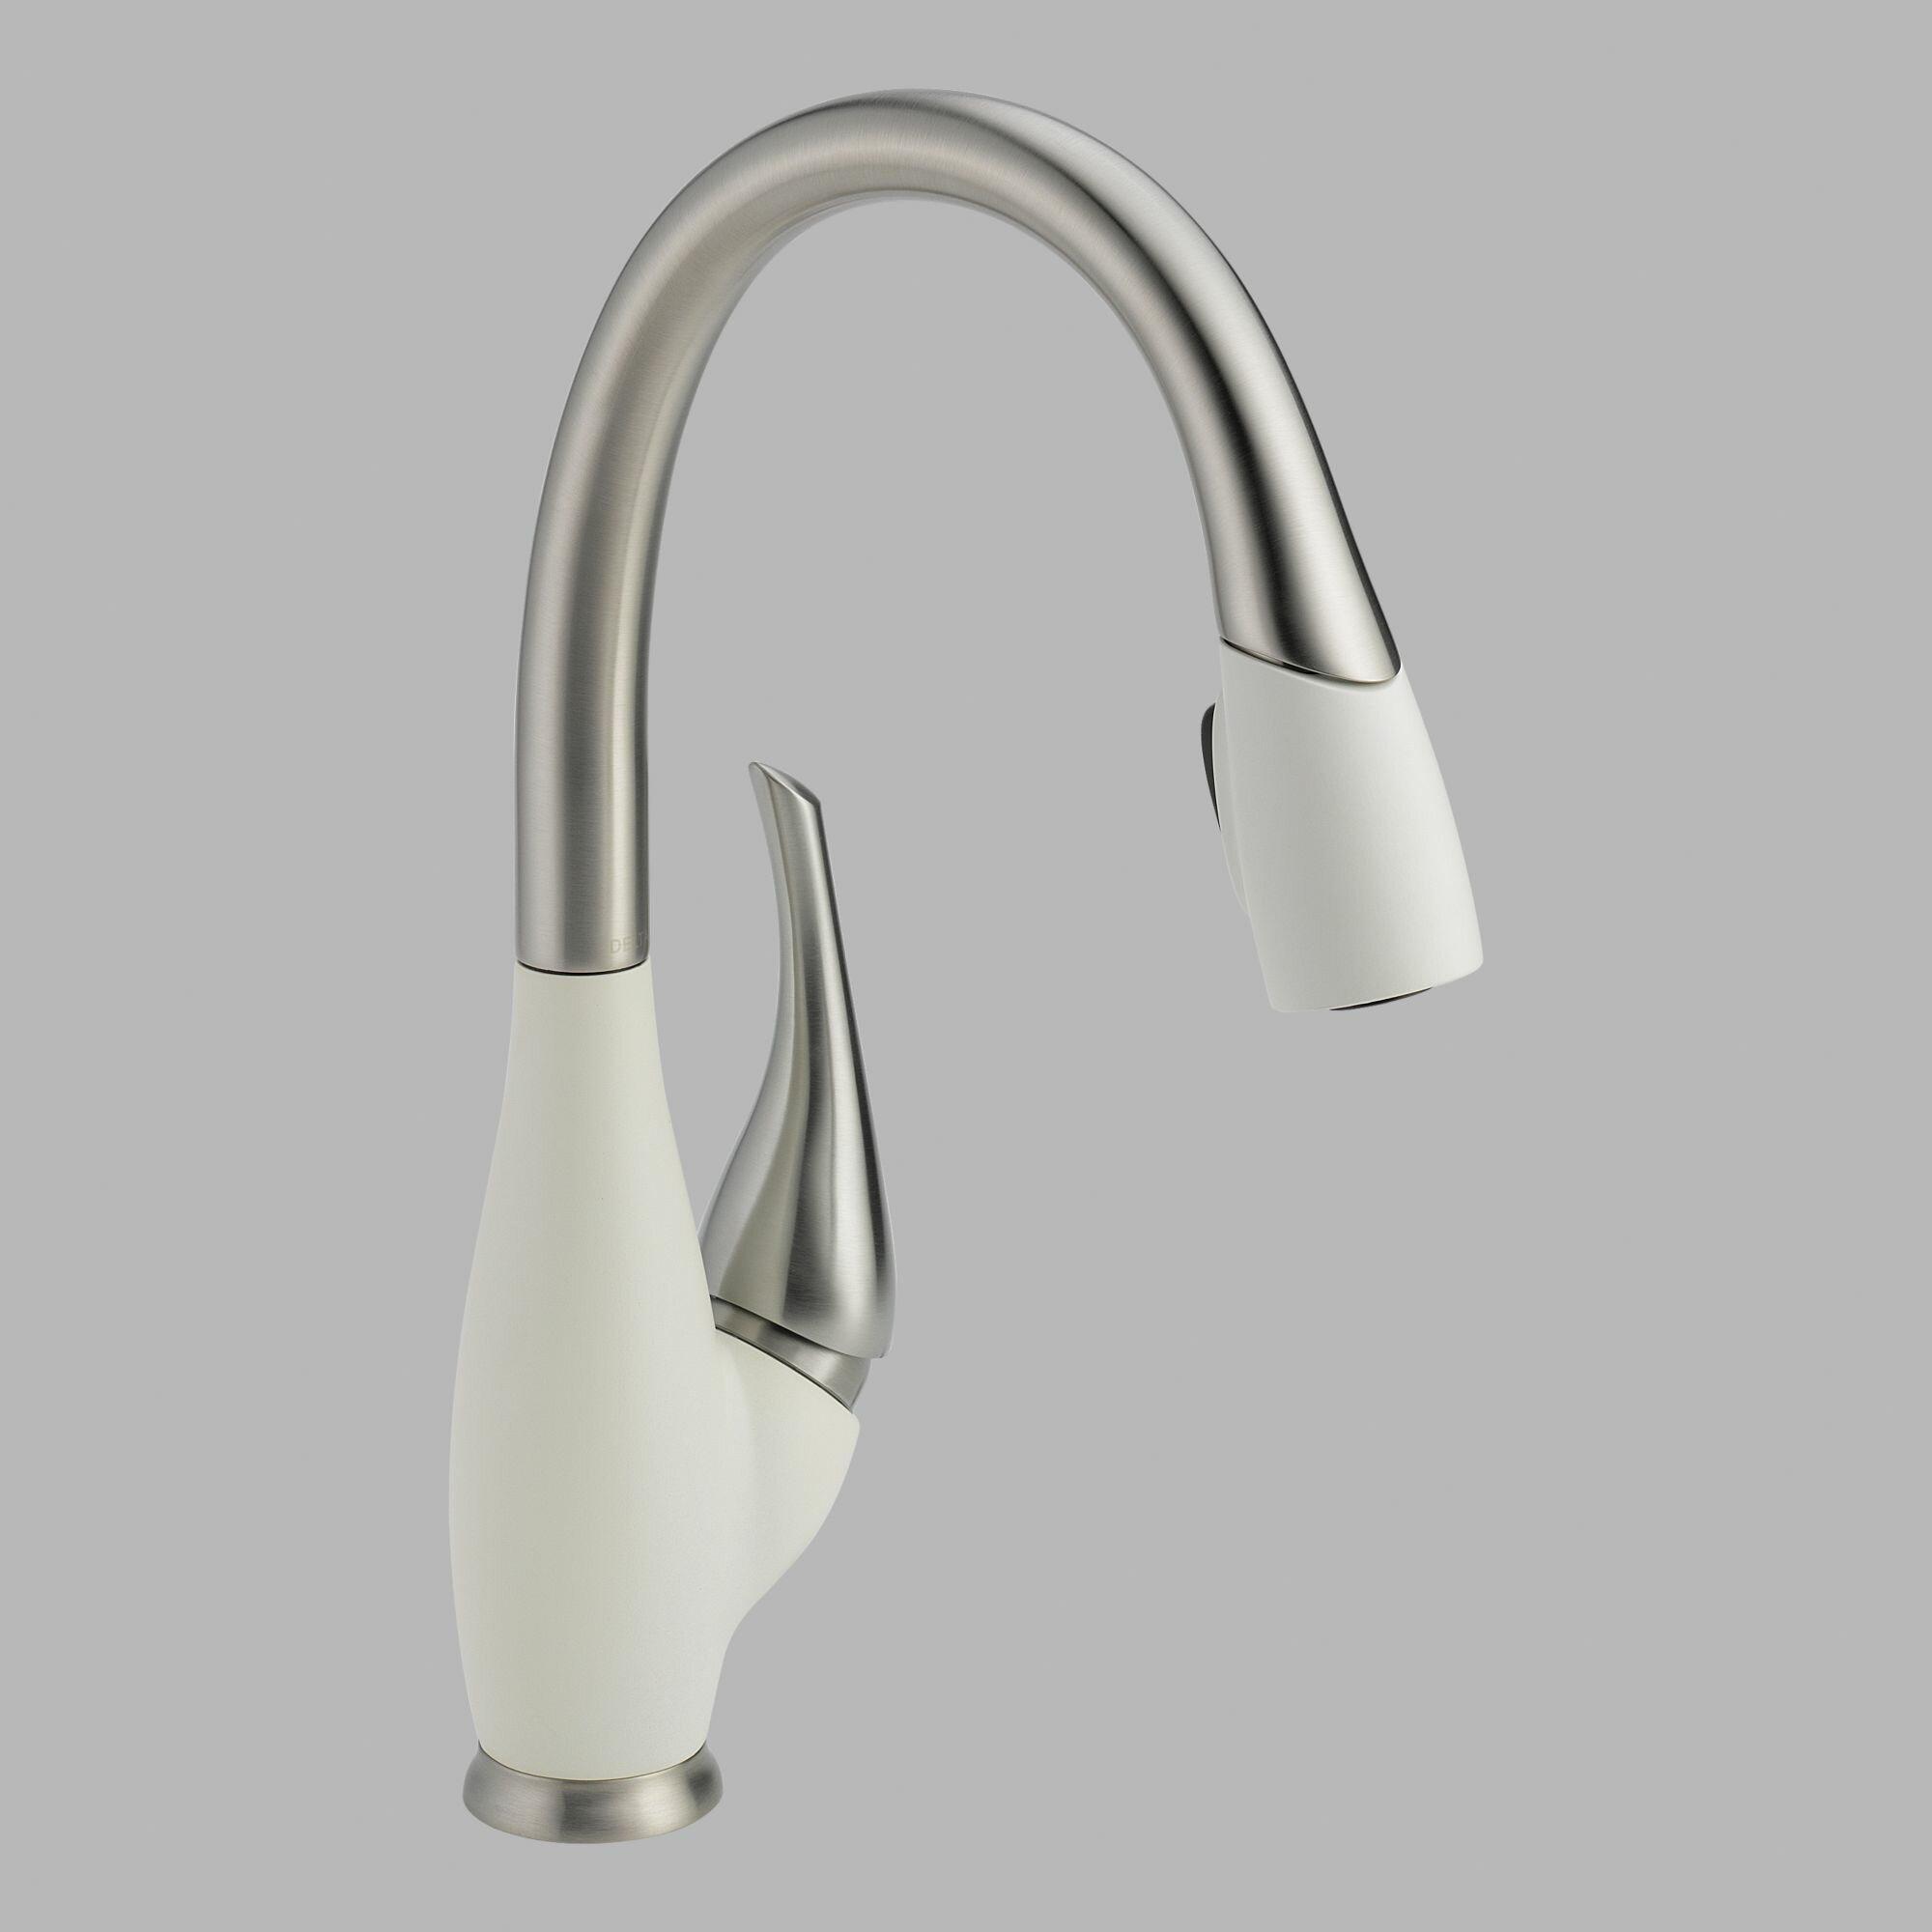 Delta Fuse Single Handle Deck Mounted Kitchen Faucet